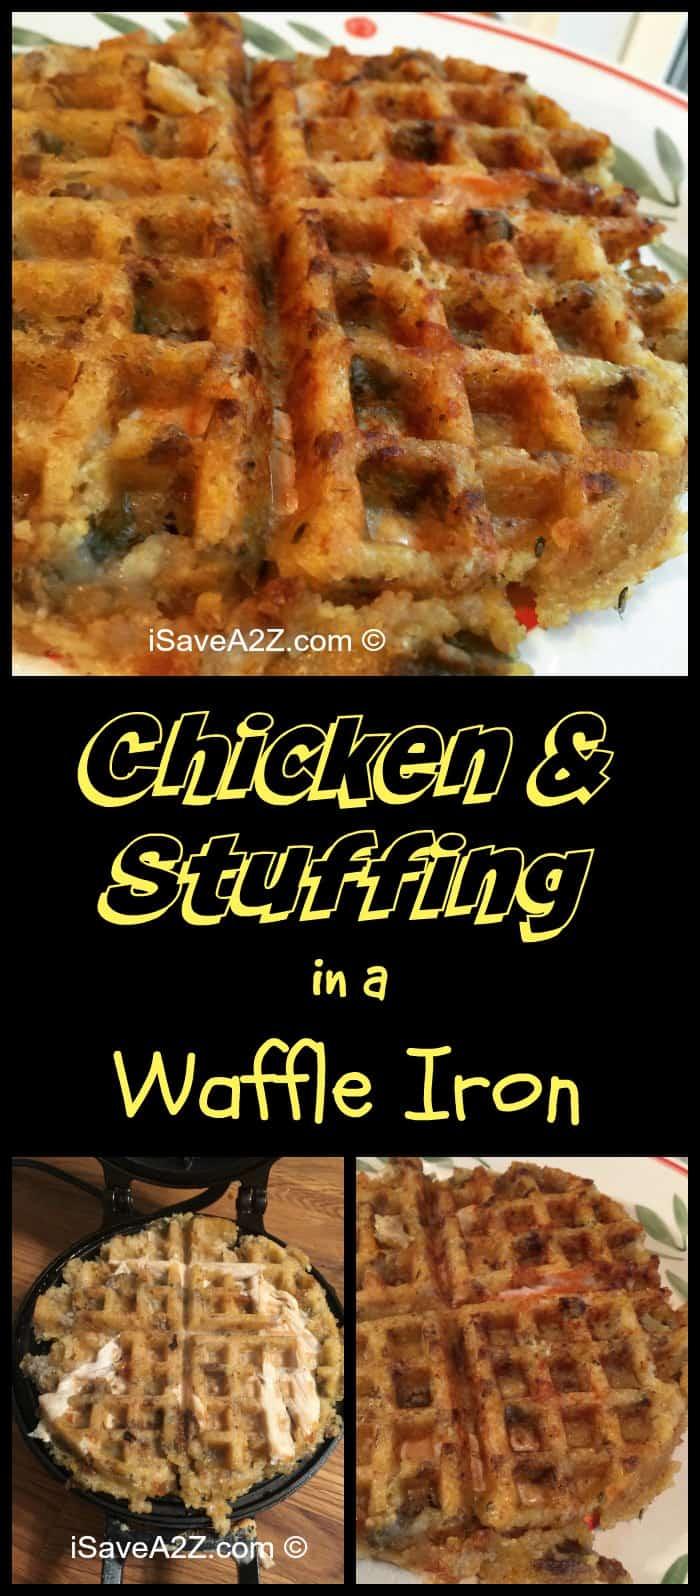 Crockpot Chicken and Stuffing Recipe - iSaveA2Z.com